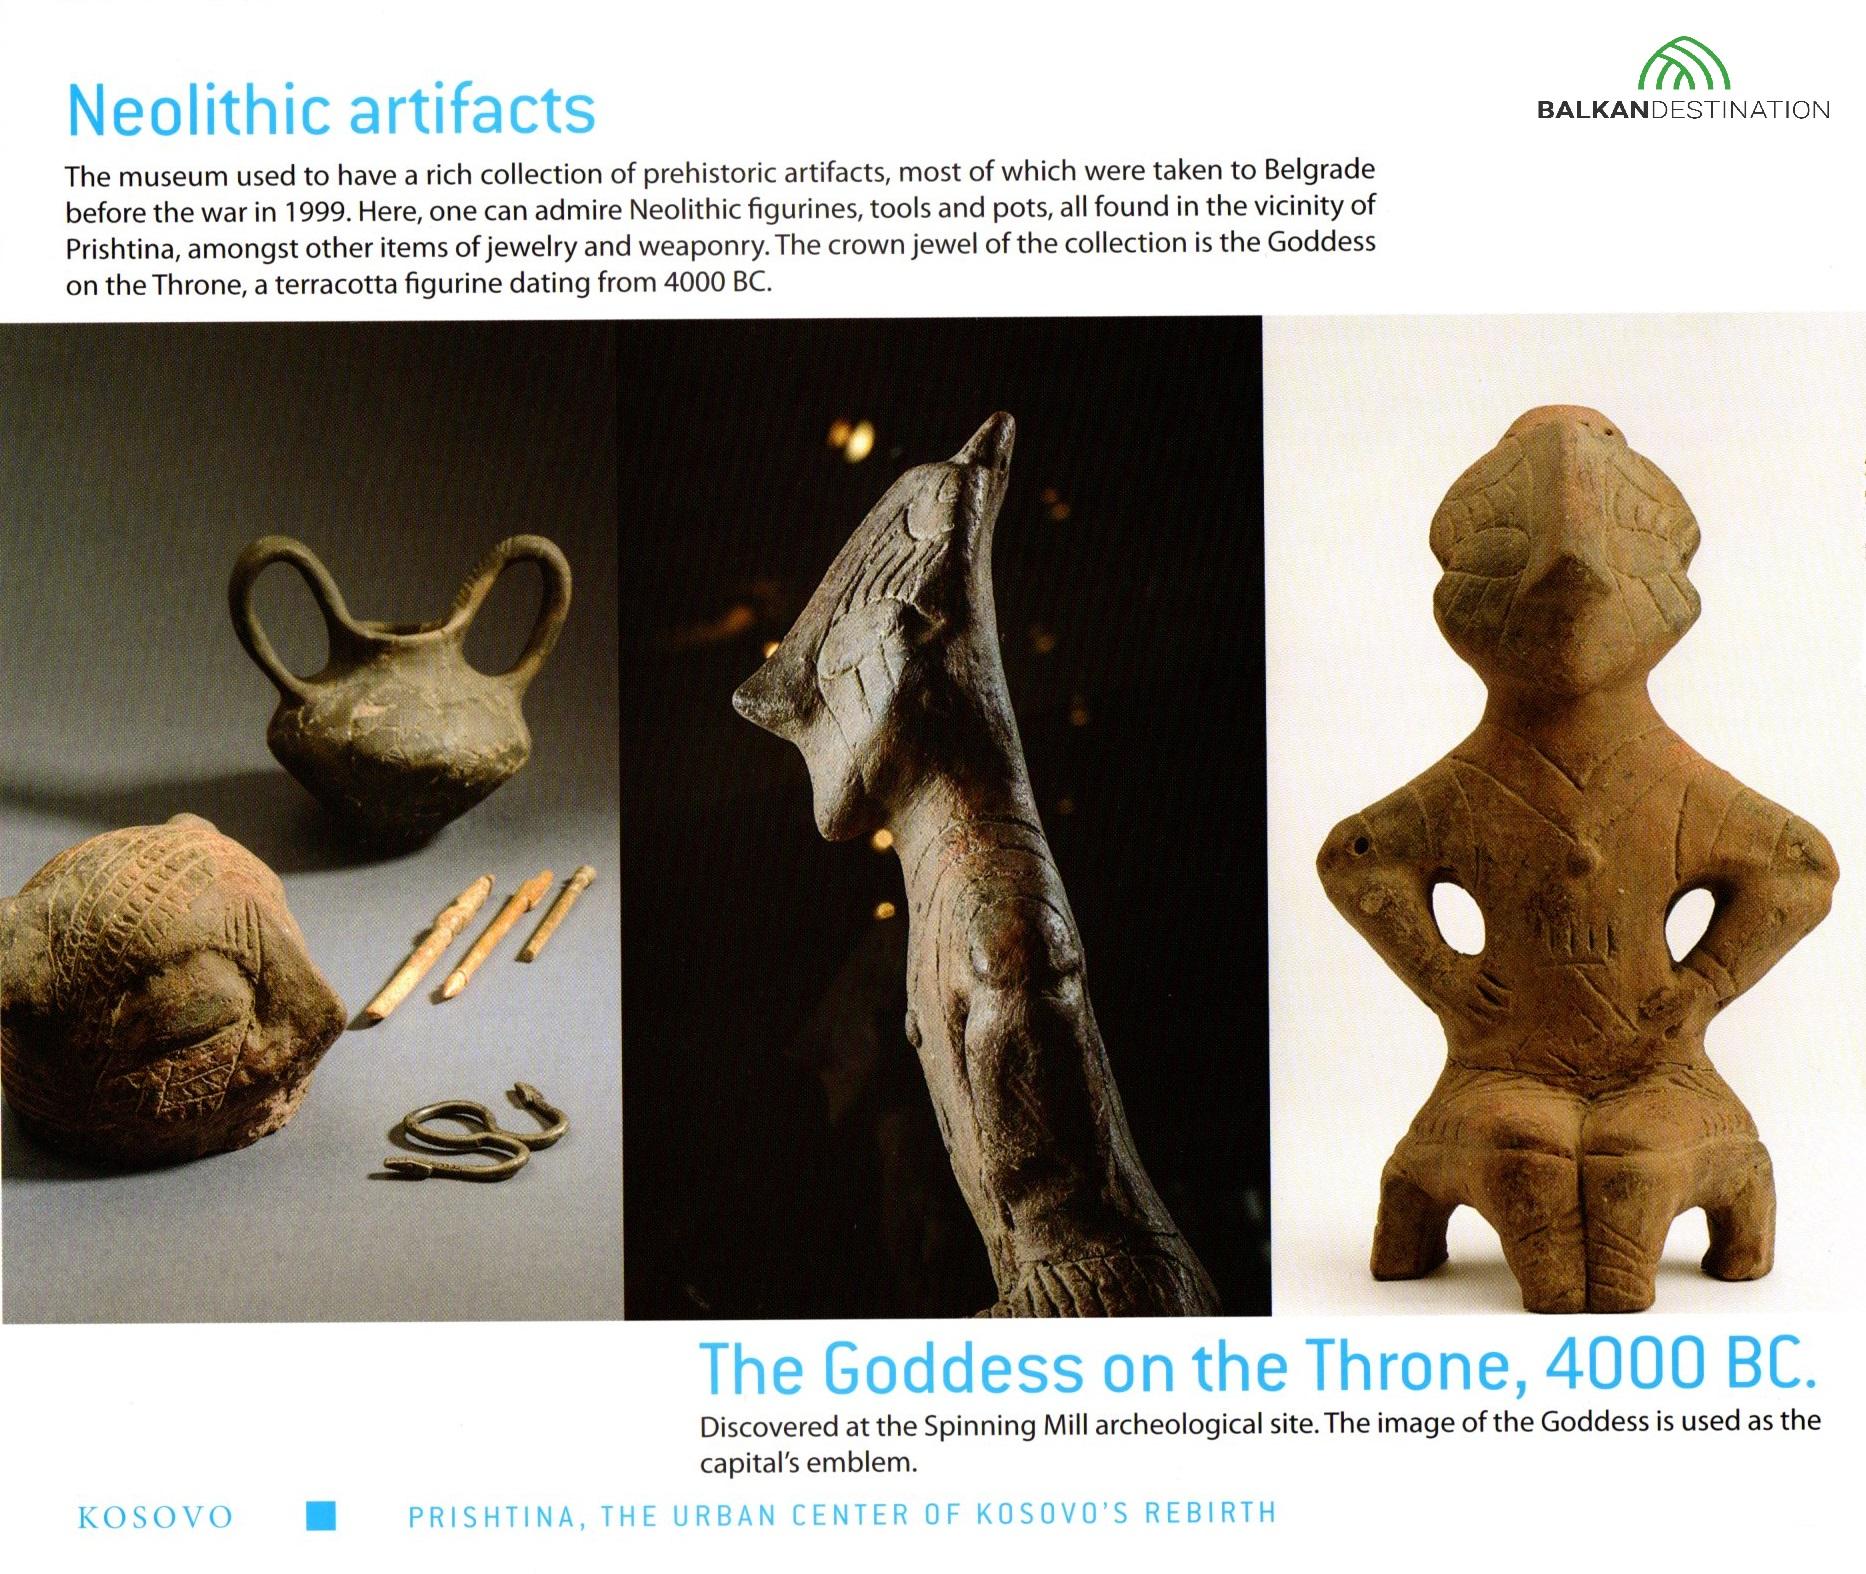 balkandestination neolithic artifacts pristina kosovo